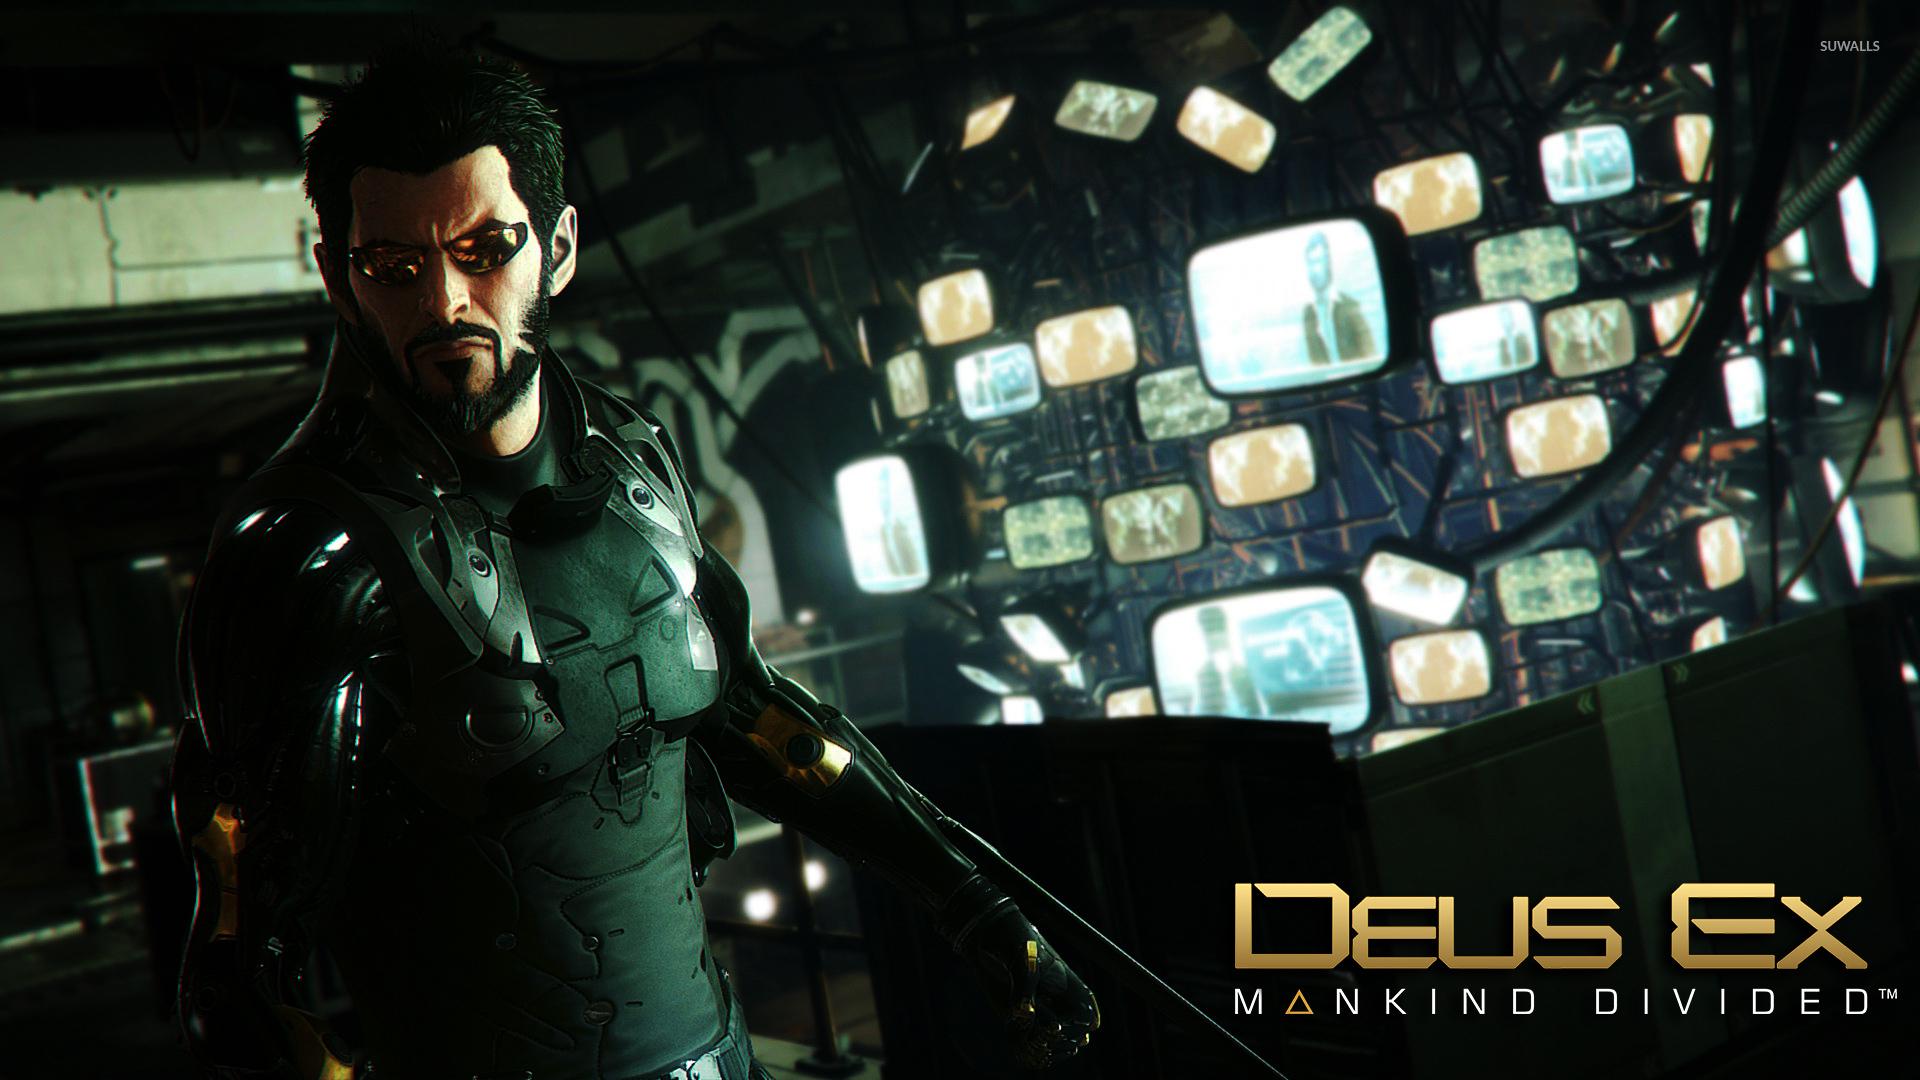 Angry Adam Jensen In Deus Ex Mankind Divided Wallpaper Game